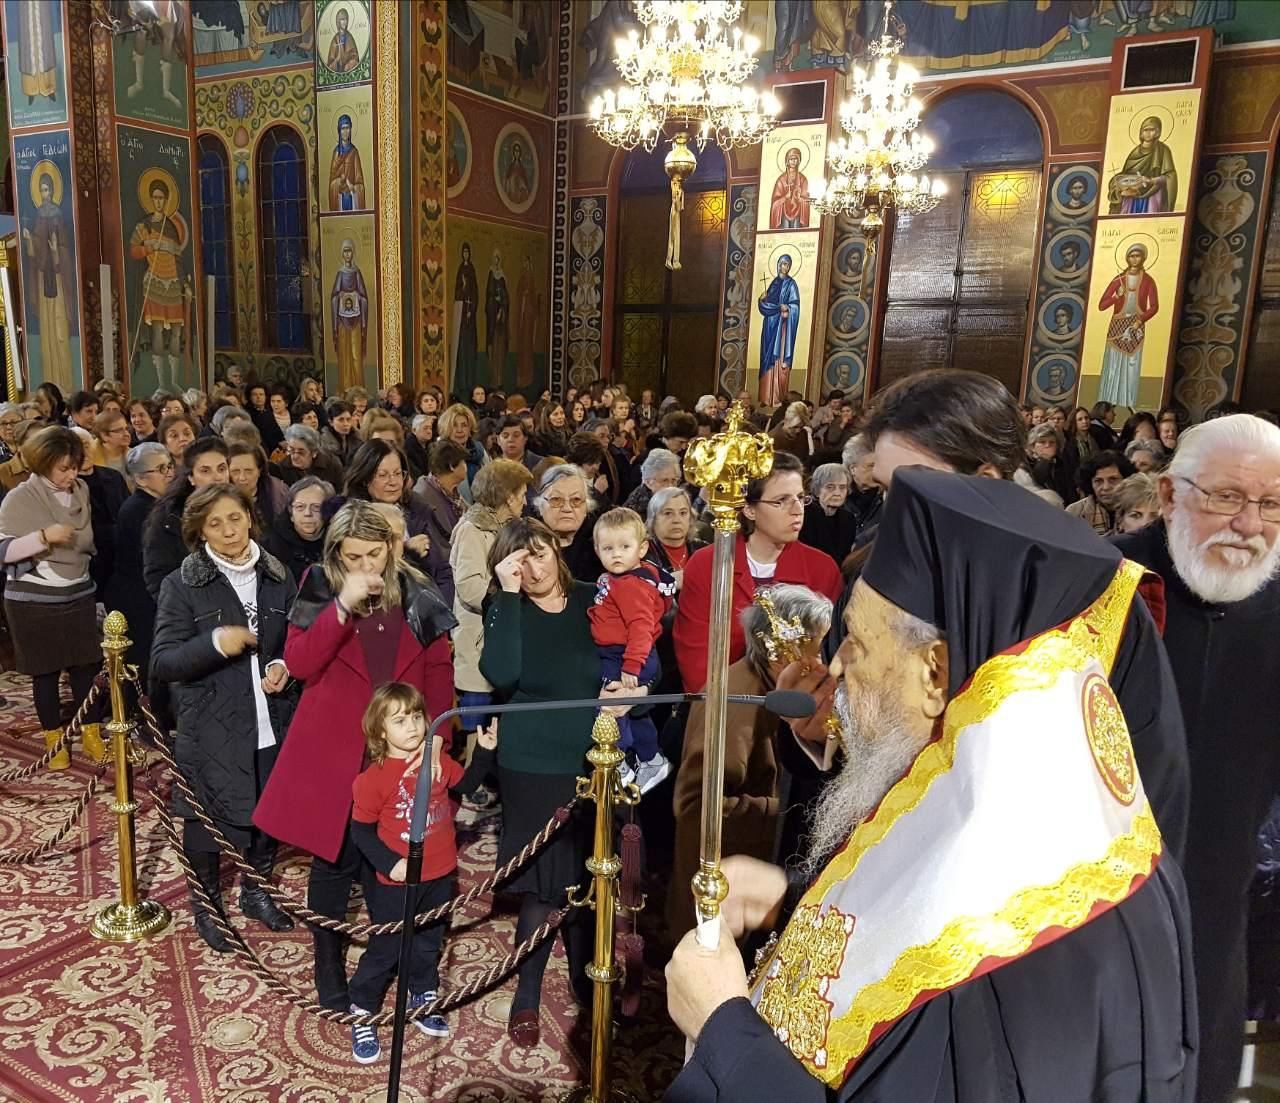 Euxelaio Xristougenna 2017 1 - Ευχέλαιο στον Ιερό Ναό του Αγίου Νικολάου στη Λάρισα